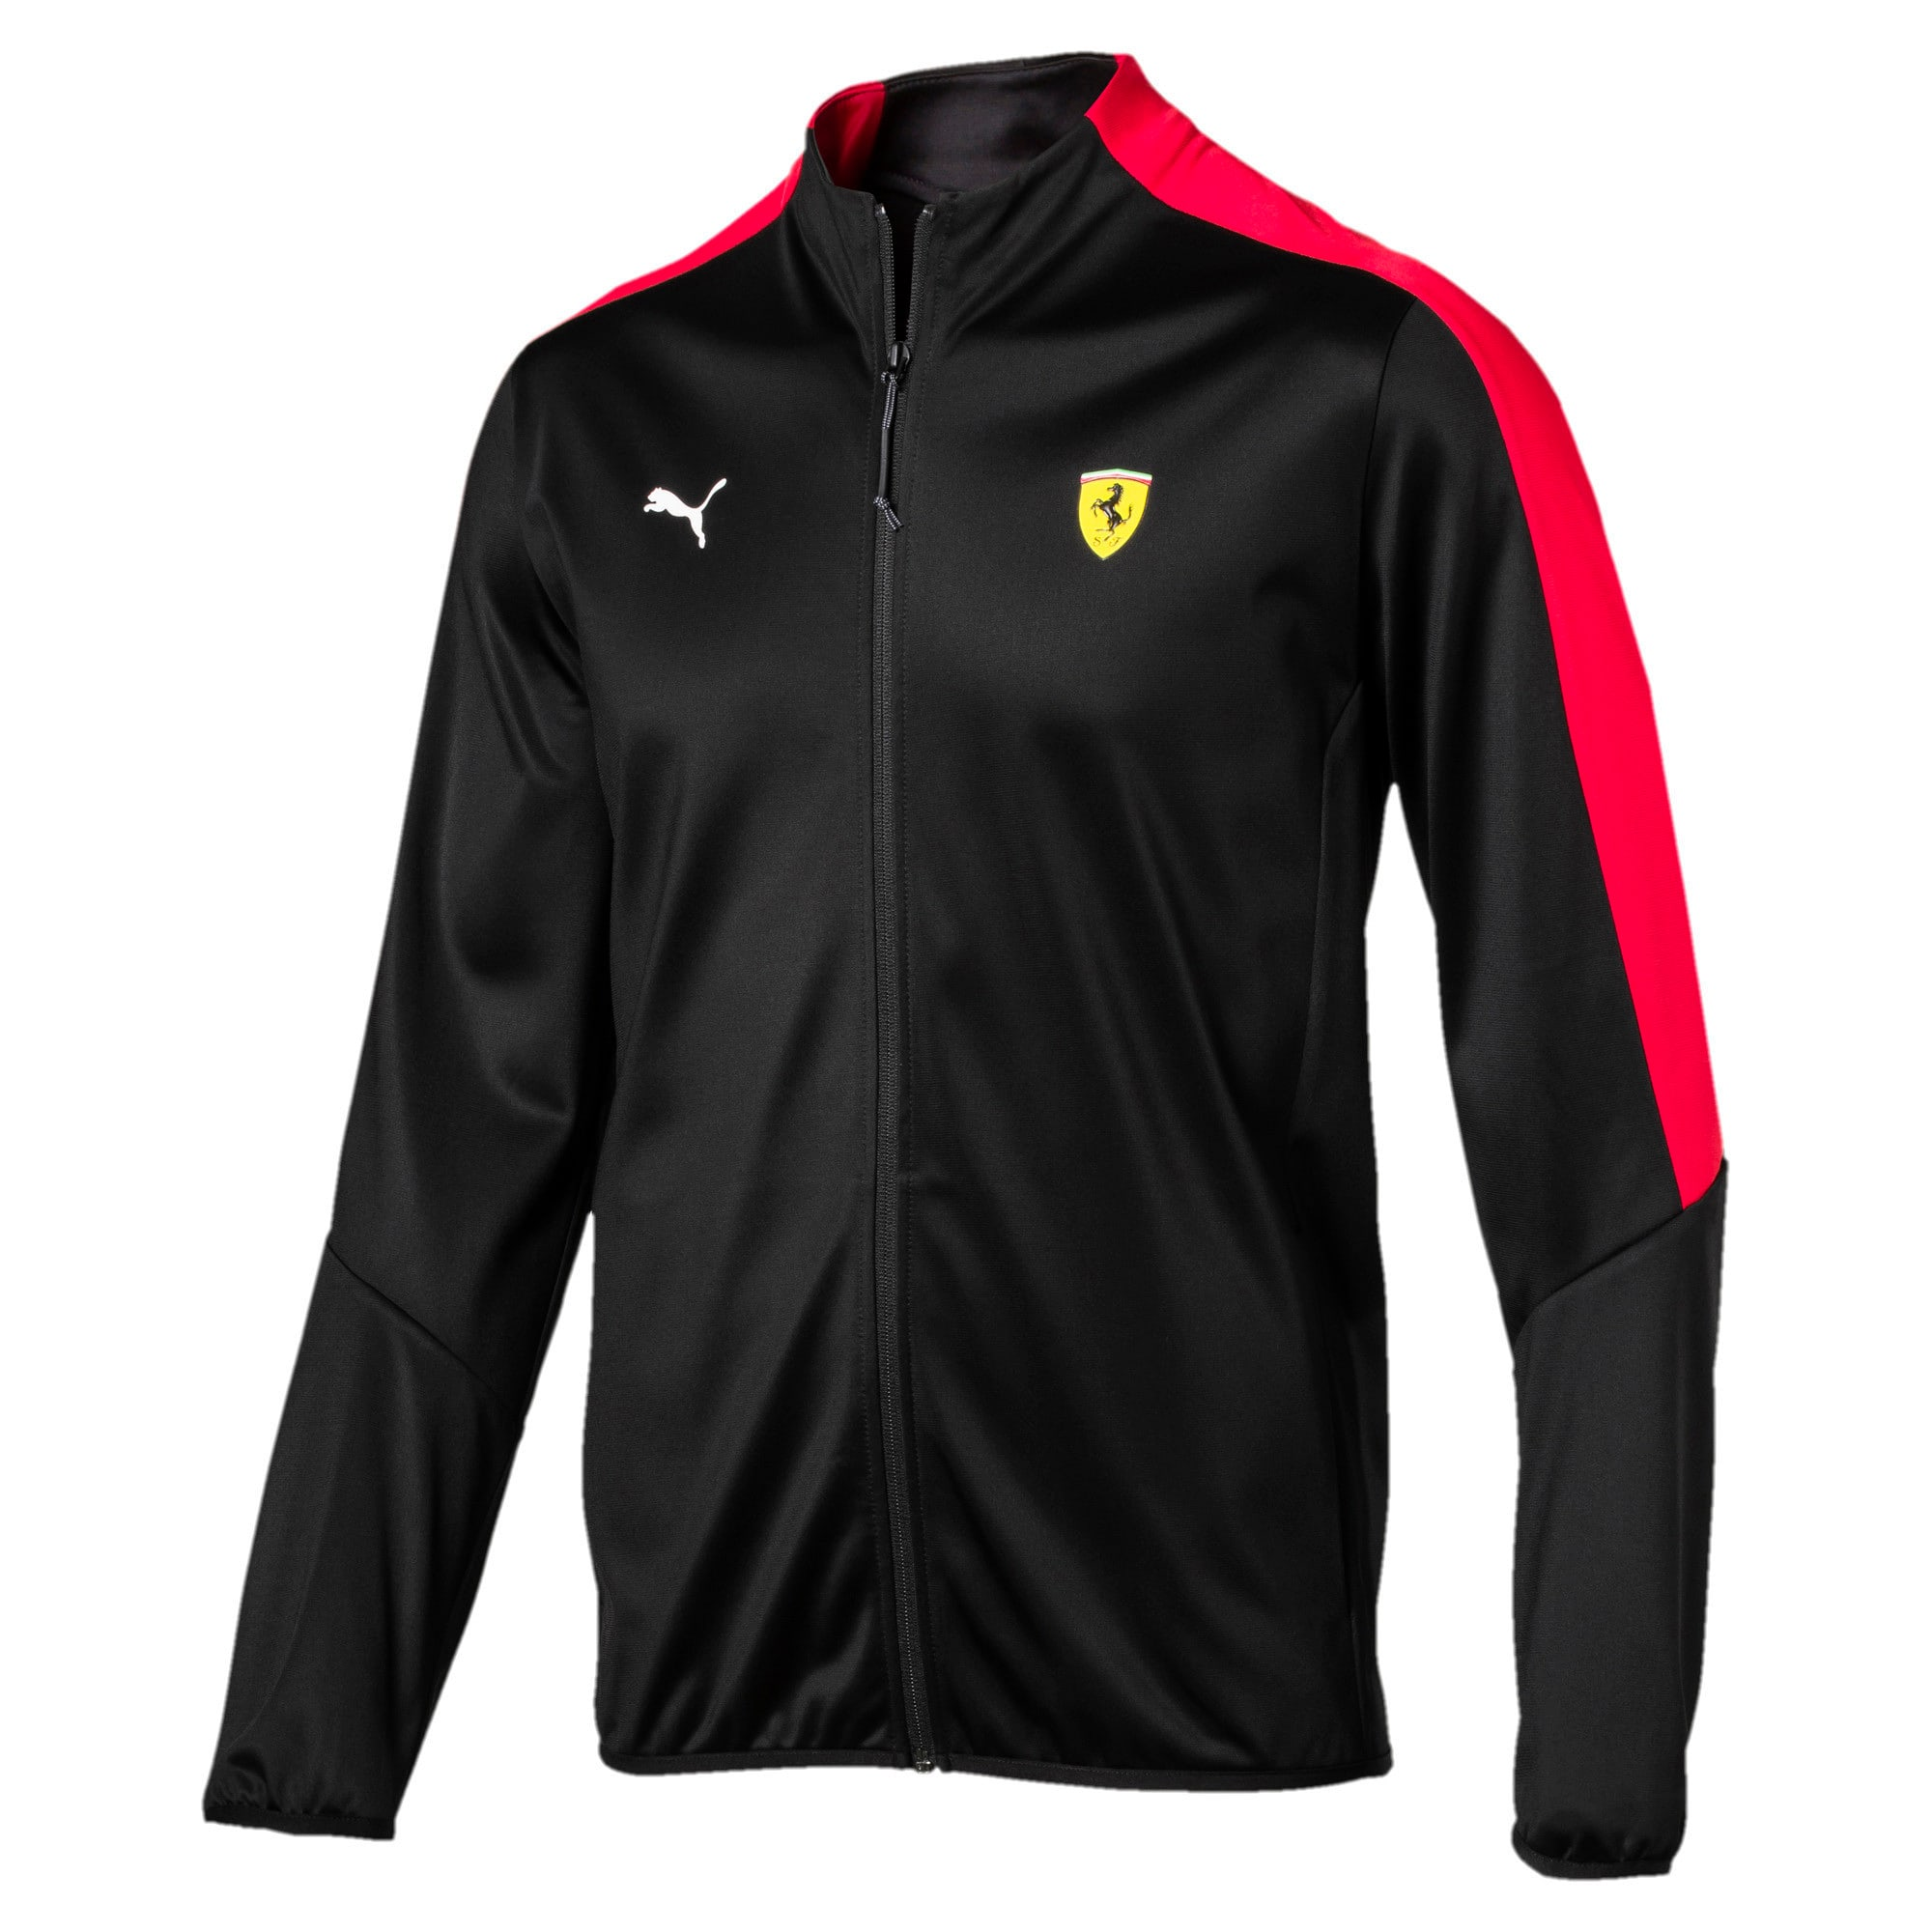 Thumbnail 2 of Ferrari Men's T7 Track Jacket, Puma Black, medium-IND